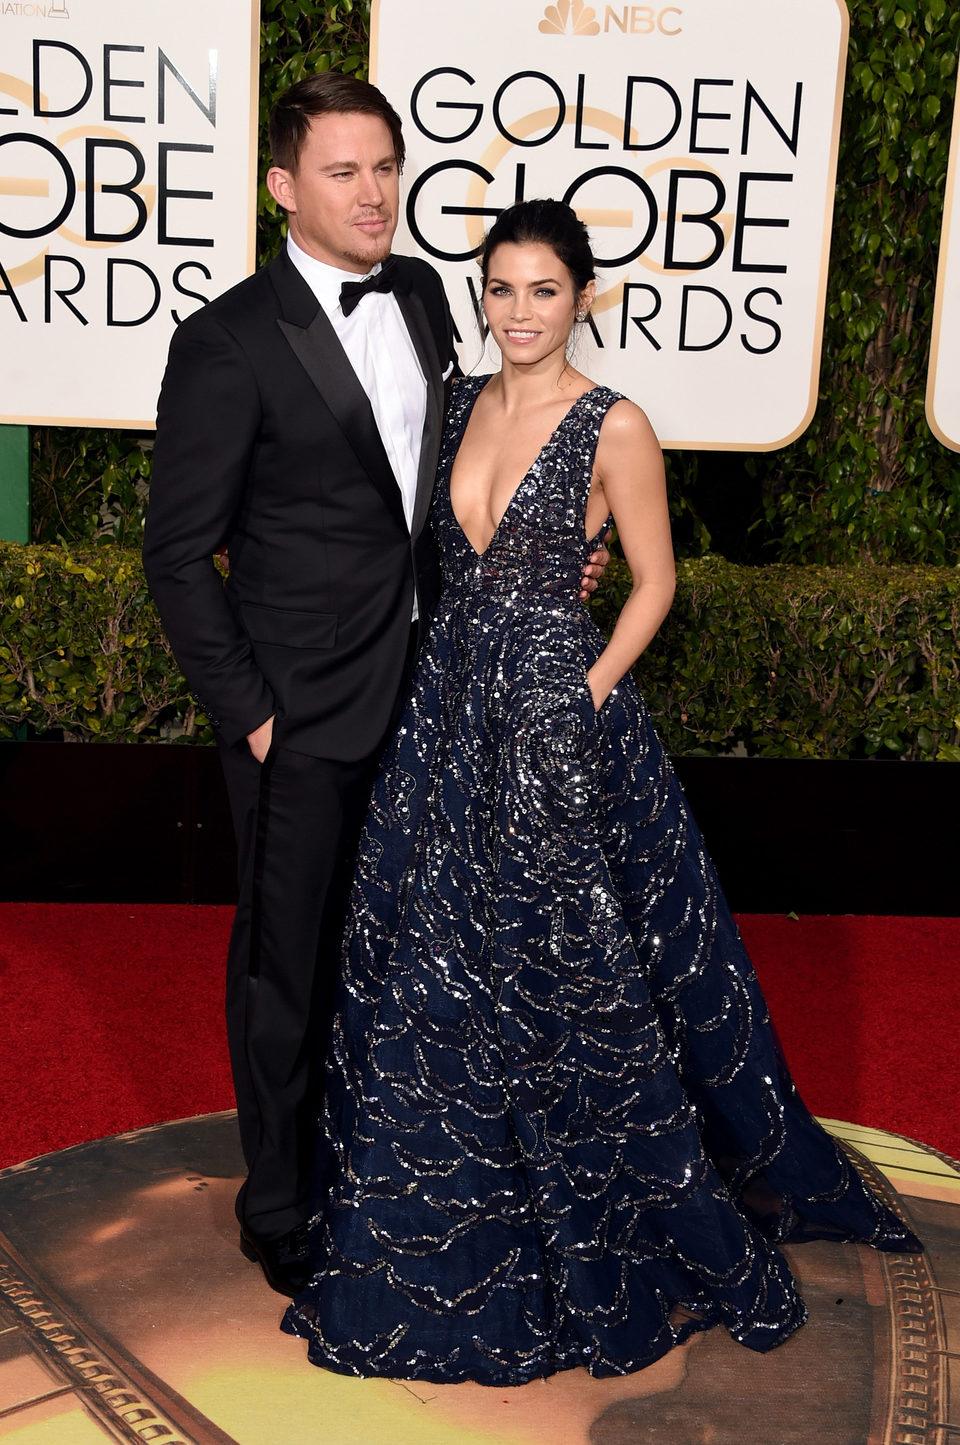 Channing Tatum and Jenna Dewan Tatum at the 2016 Golden Globes red carpet